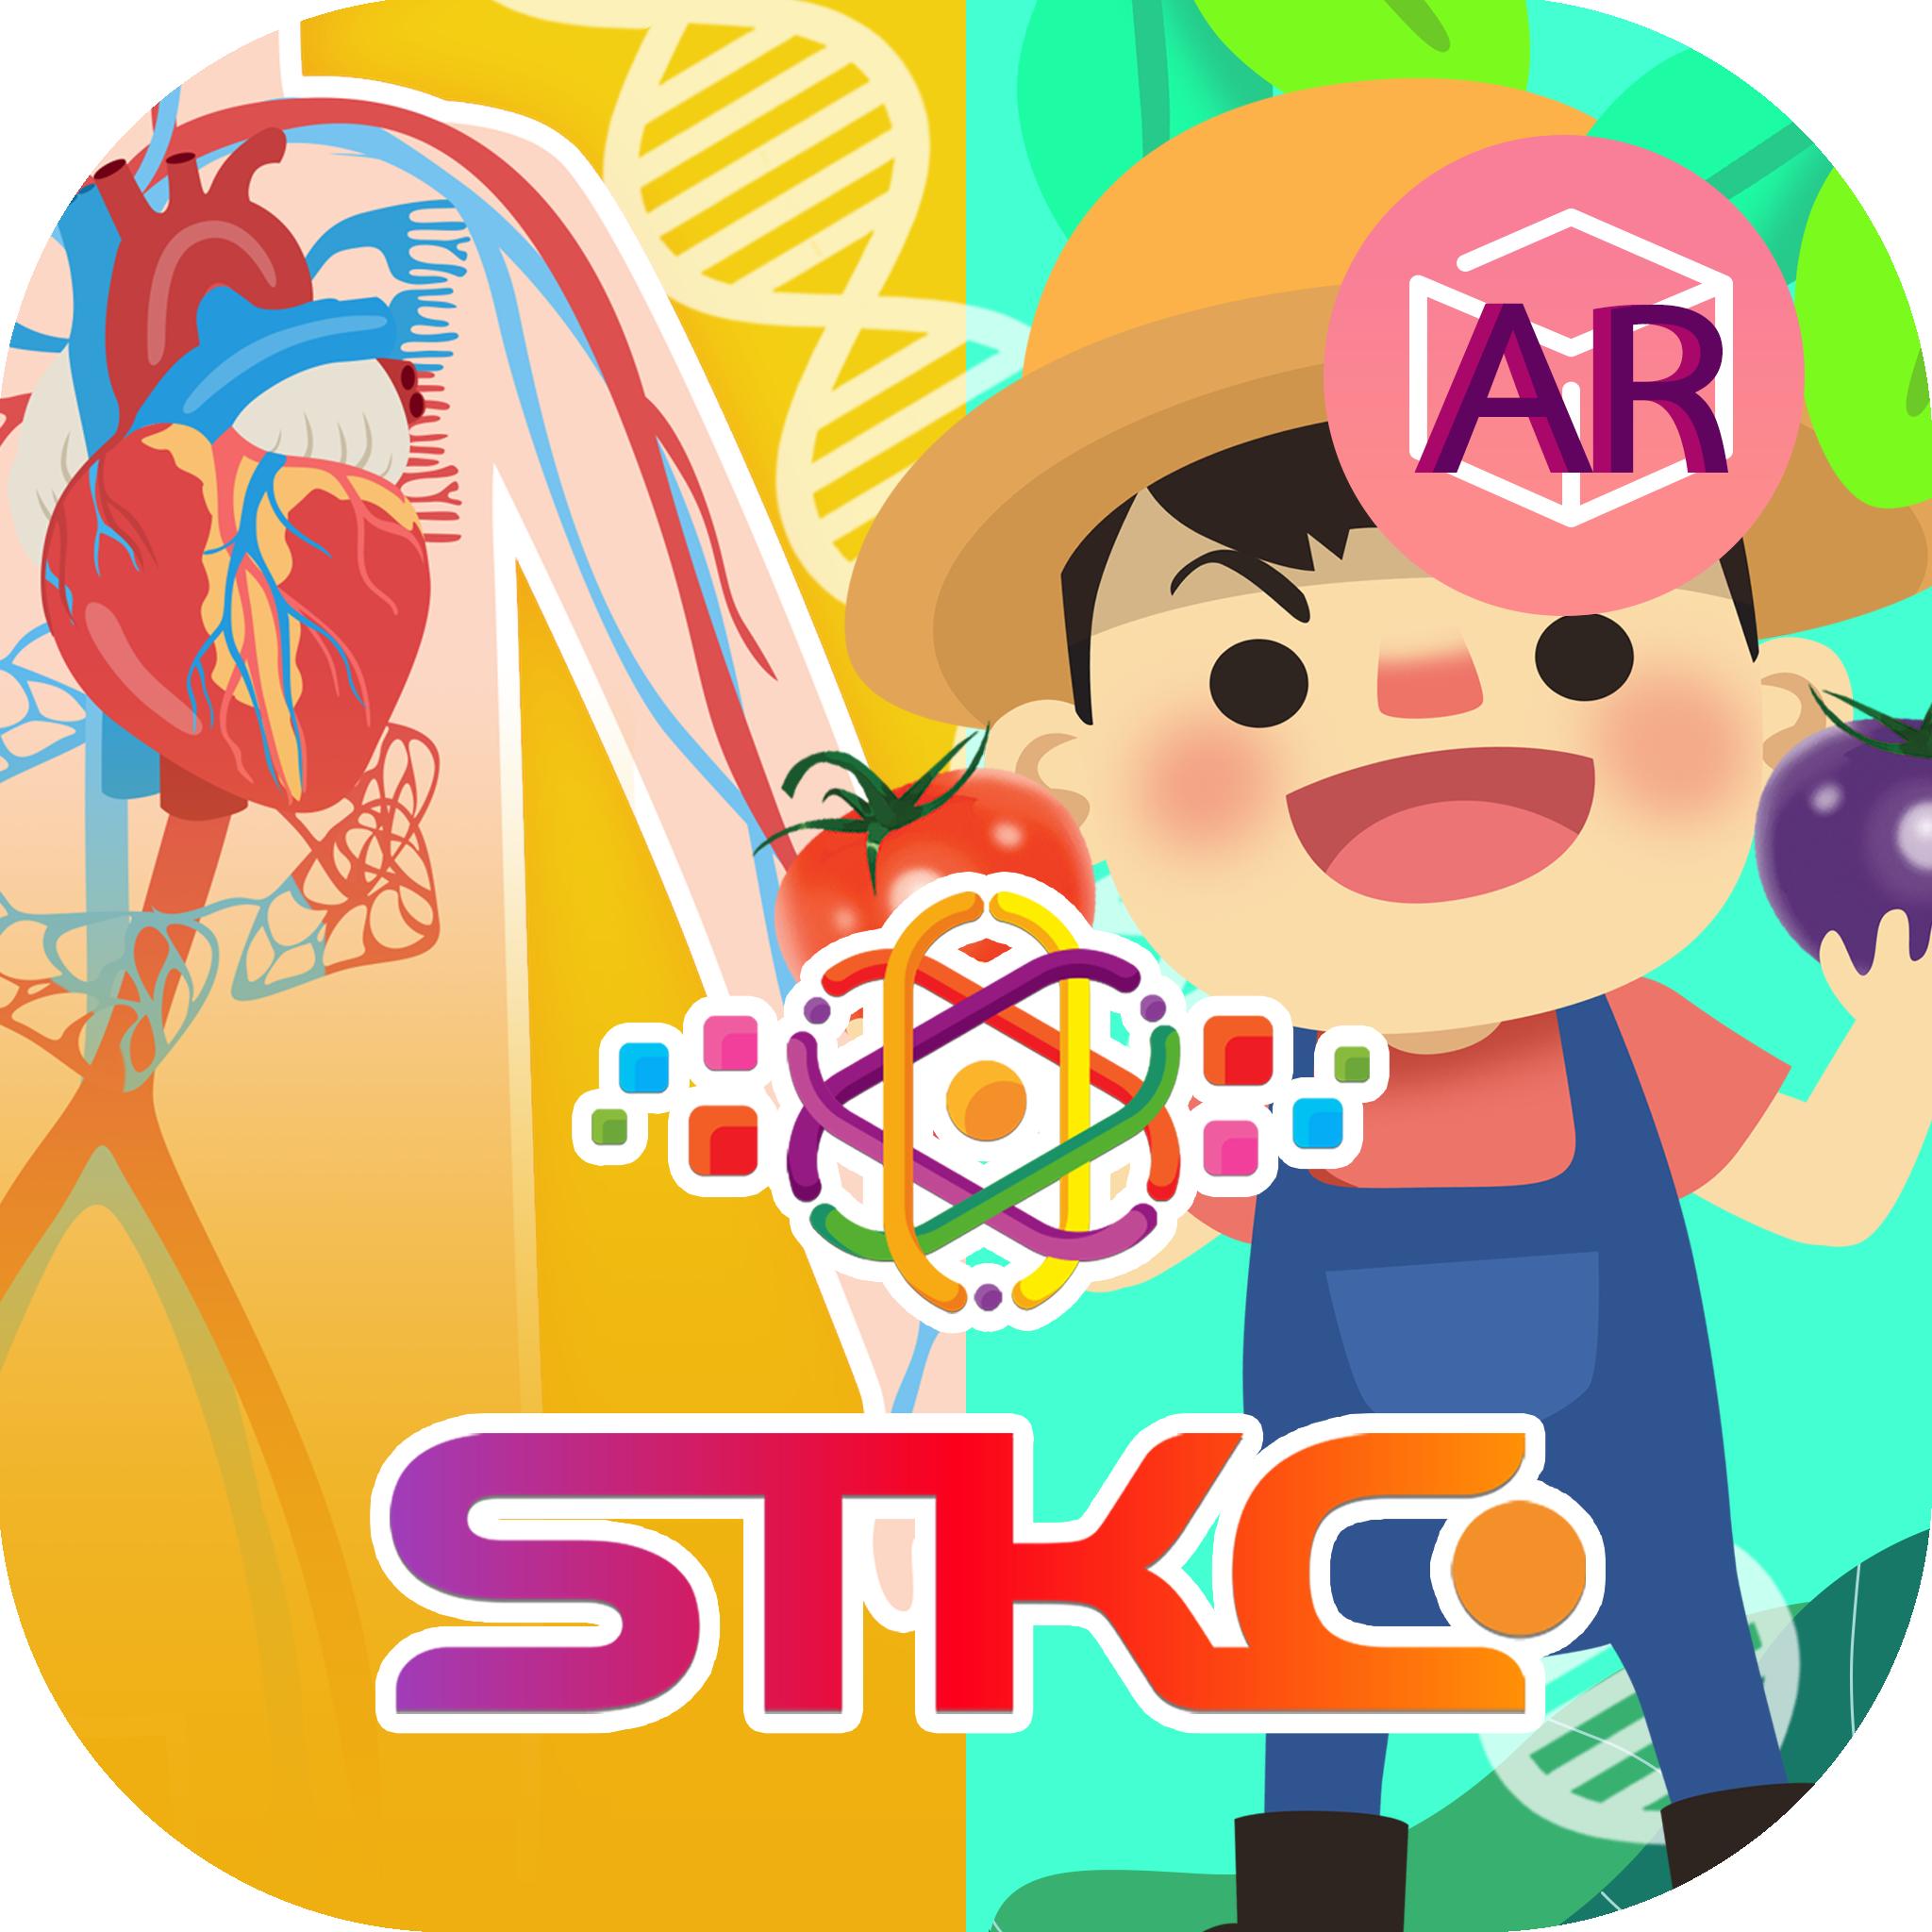 STKC Bio AR